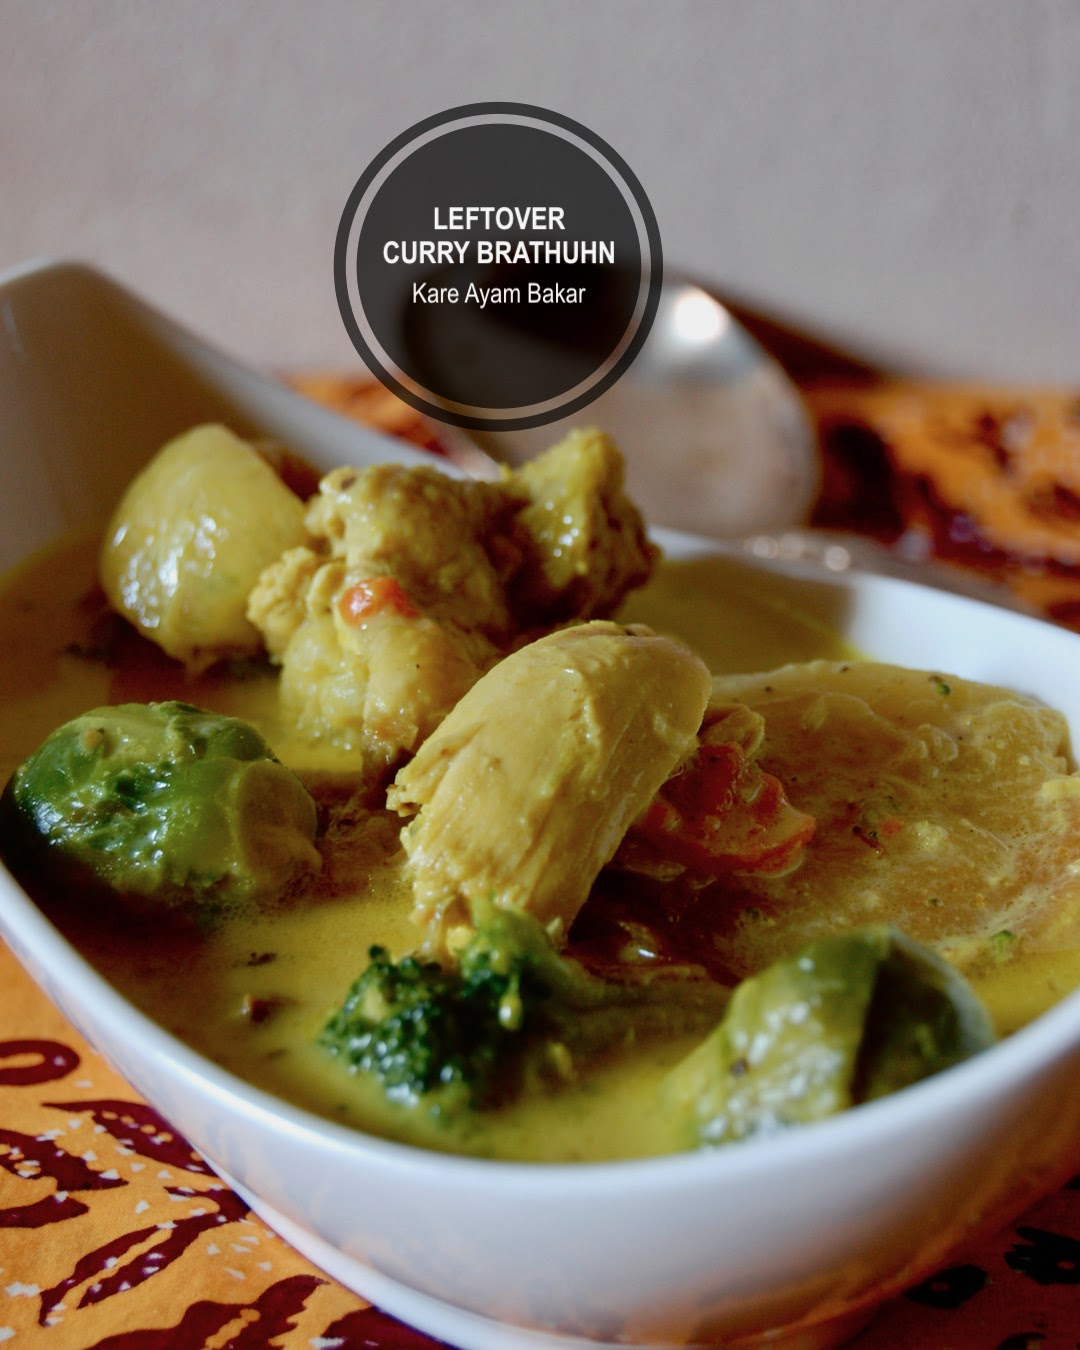 Leftover: Curry aus Übriggebliebenes Brathuhn